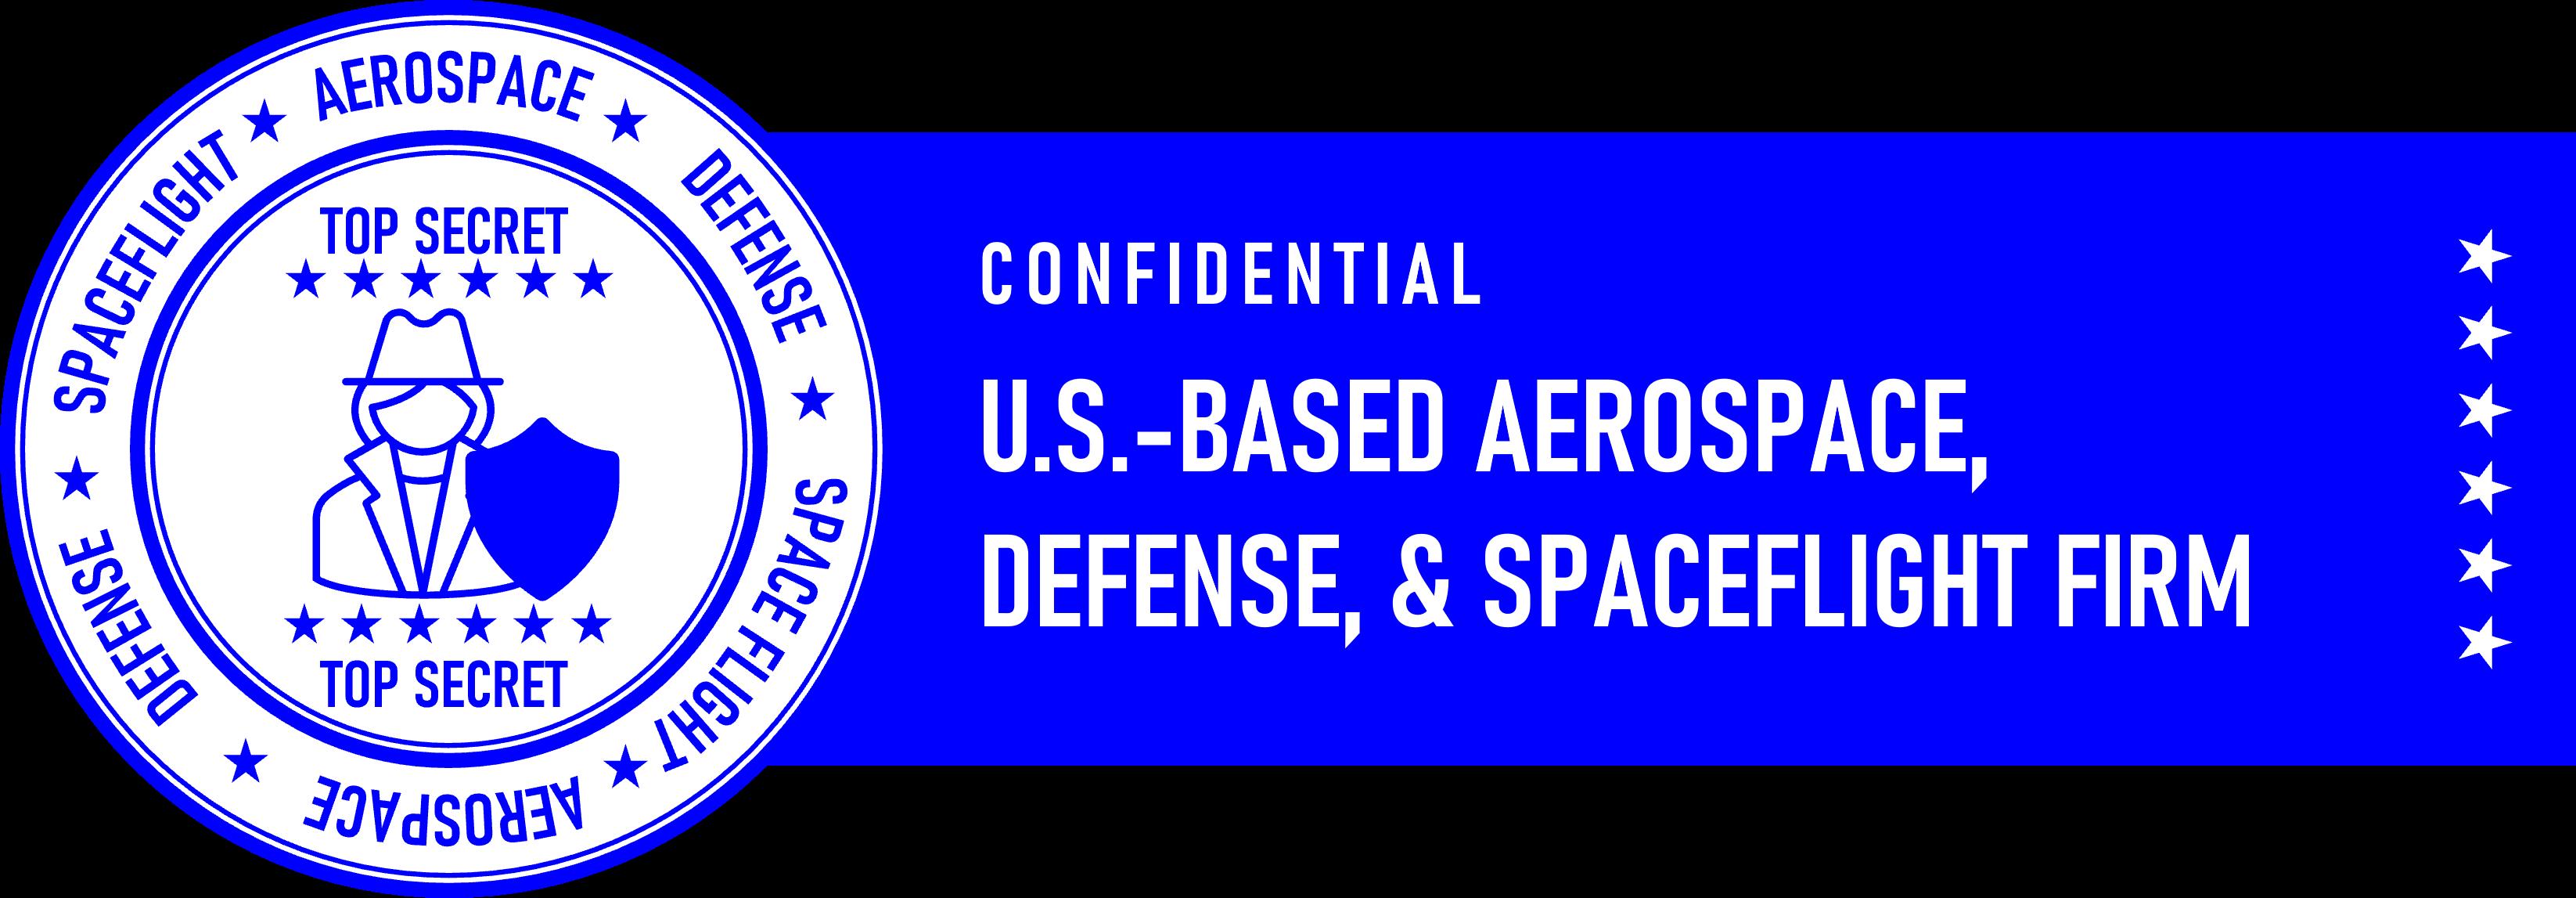 Confidential: Aeorspace Manufacturer